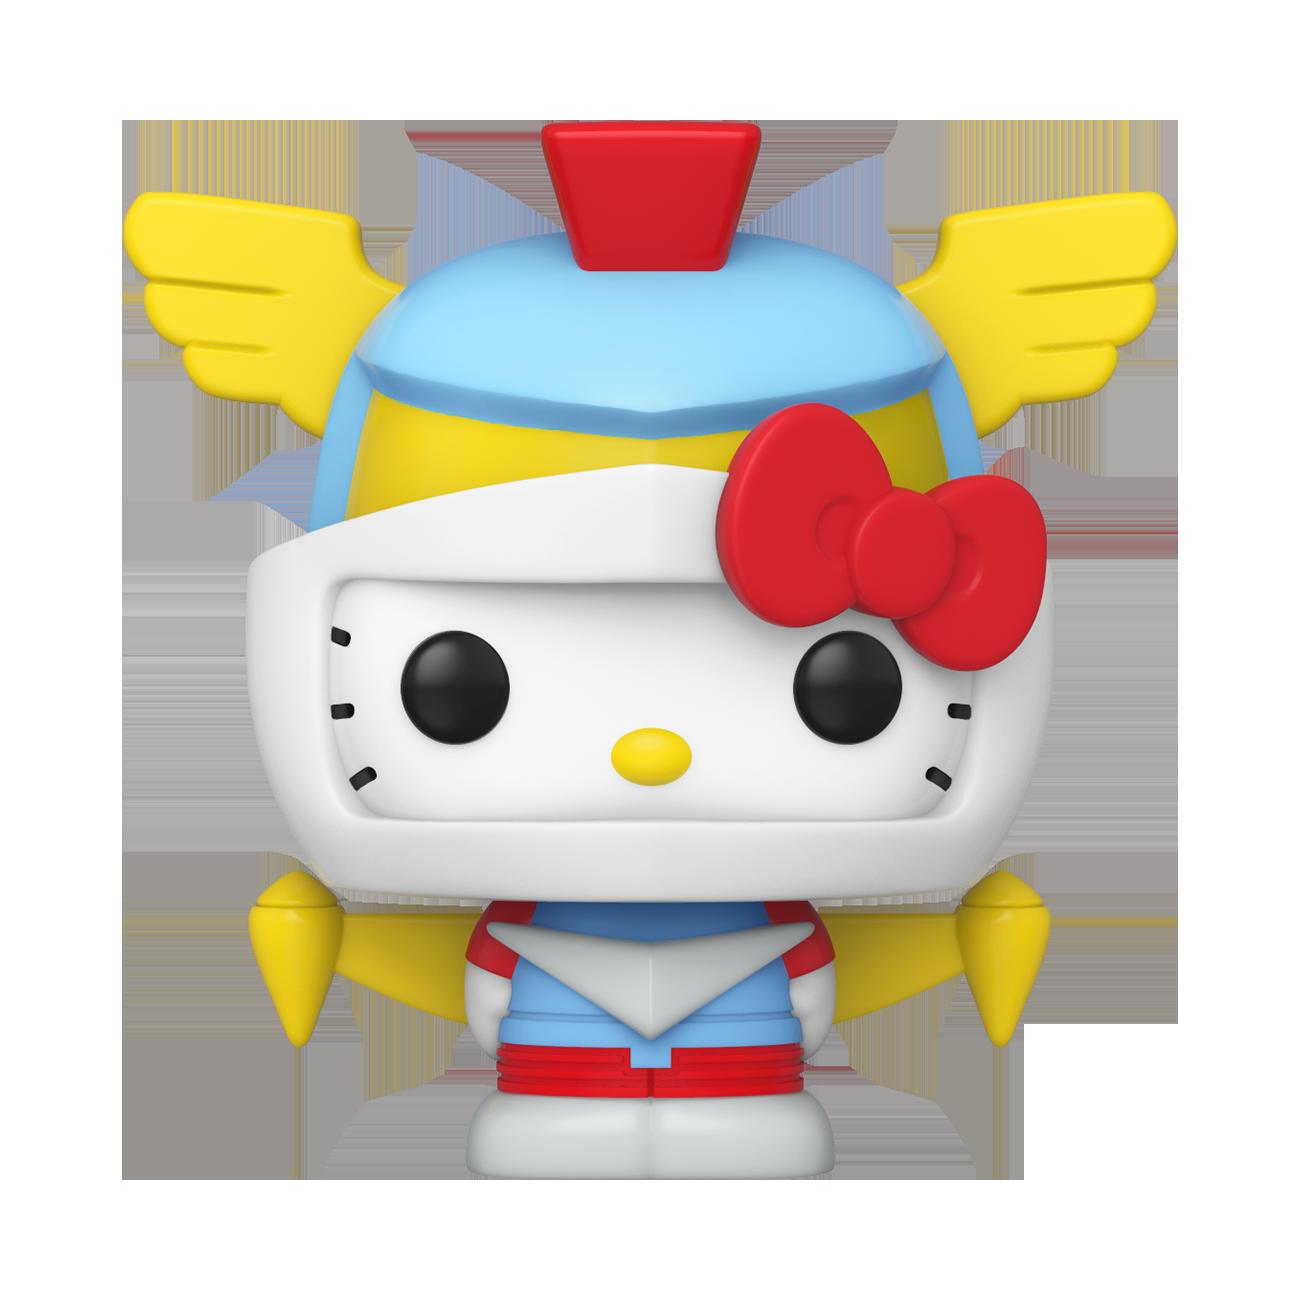 Sanrio Hello Kitty Robot Summer Convention 2020 Exclusive Pop! Vinyl Figure